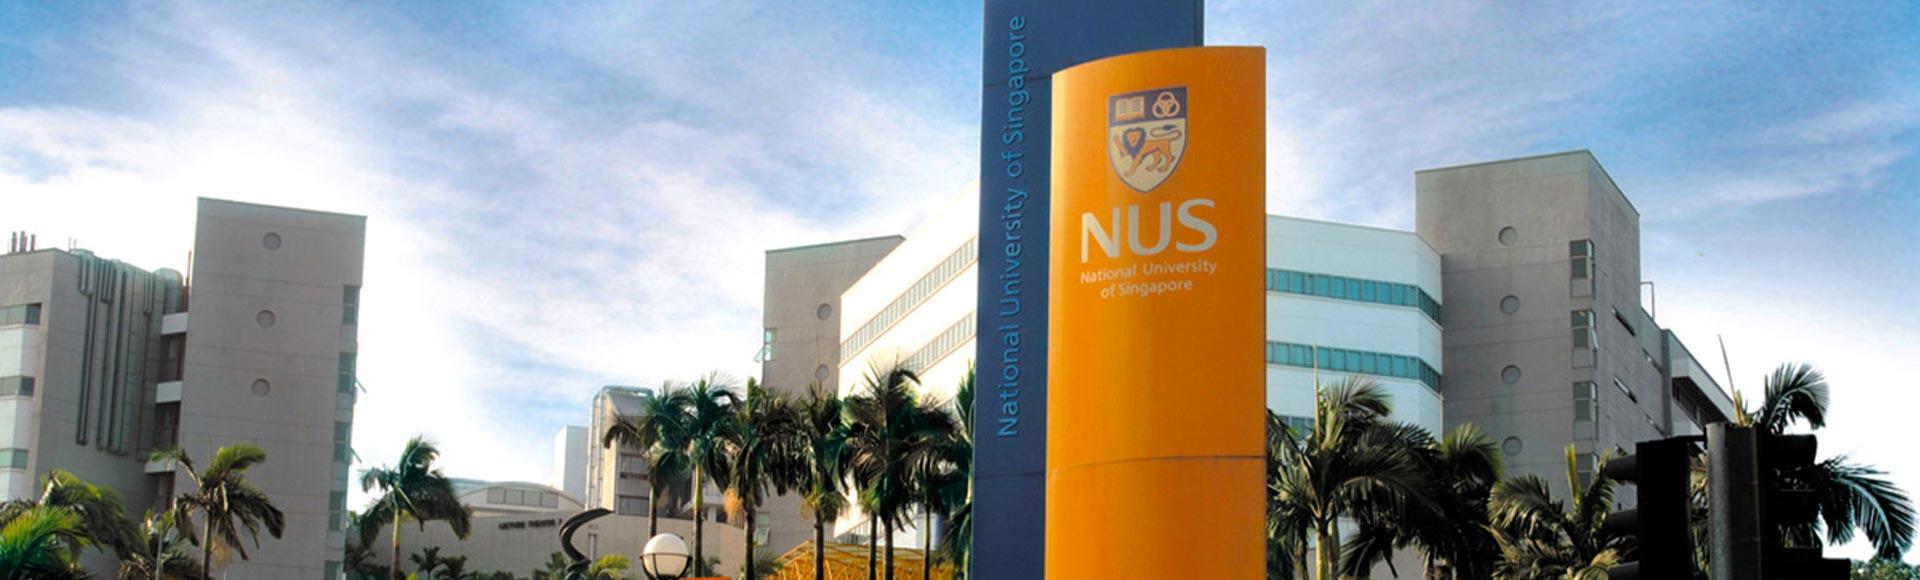 national-university-singapore.jpg